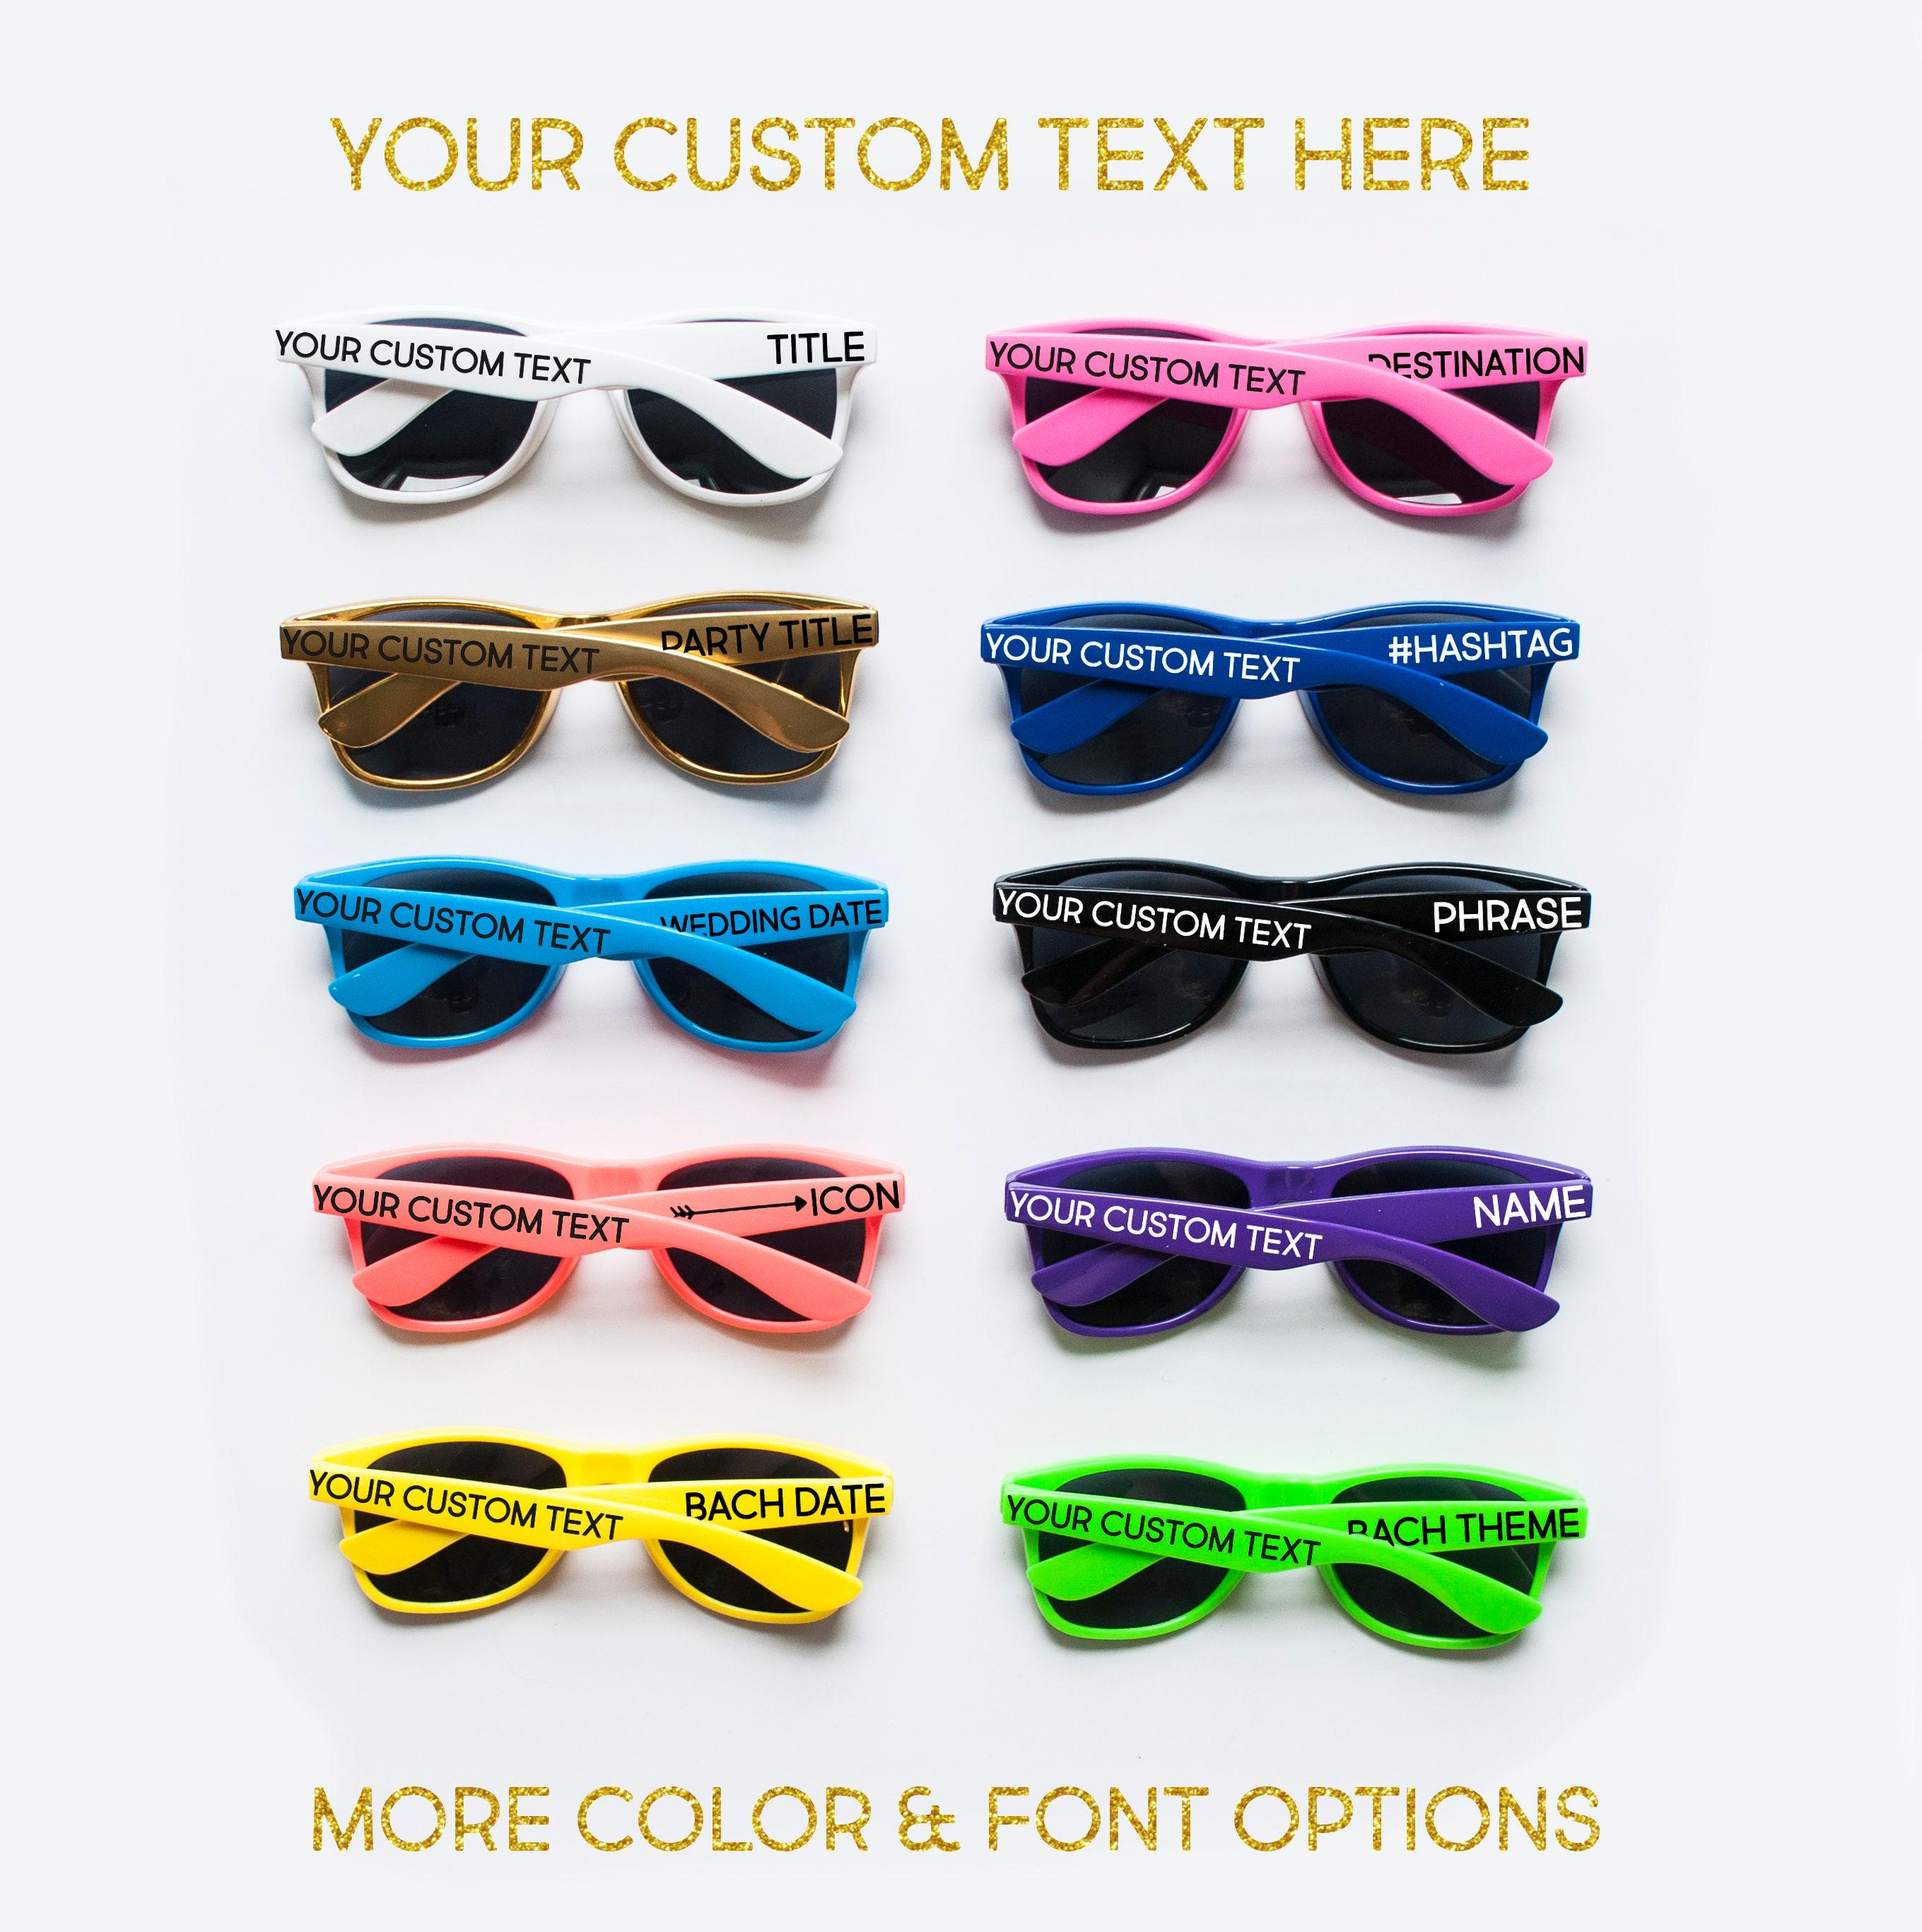 Personalized Sunglasses Custom Sunglasses Bachelorette